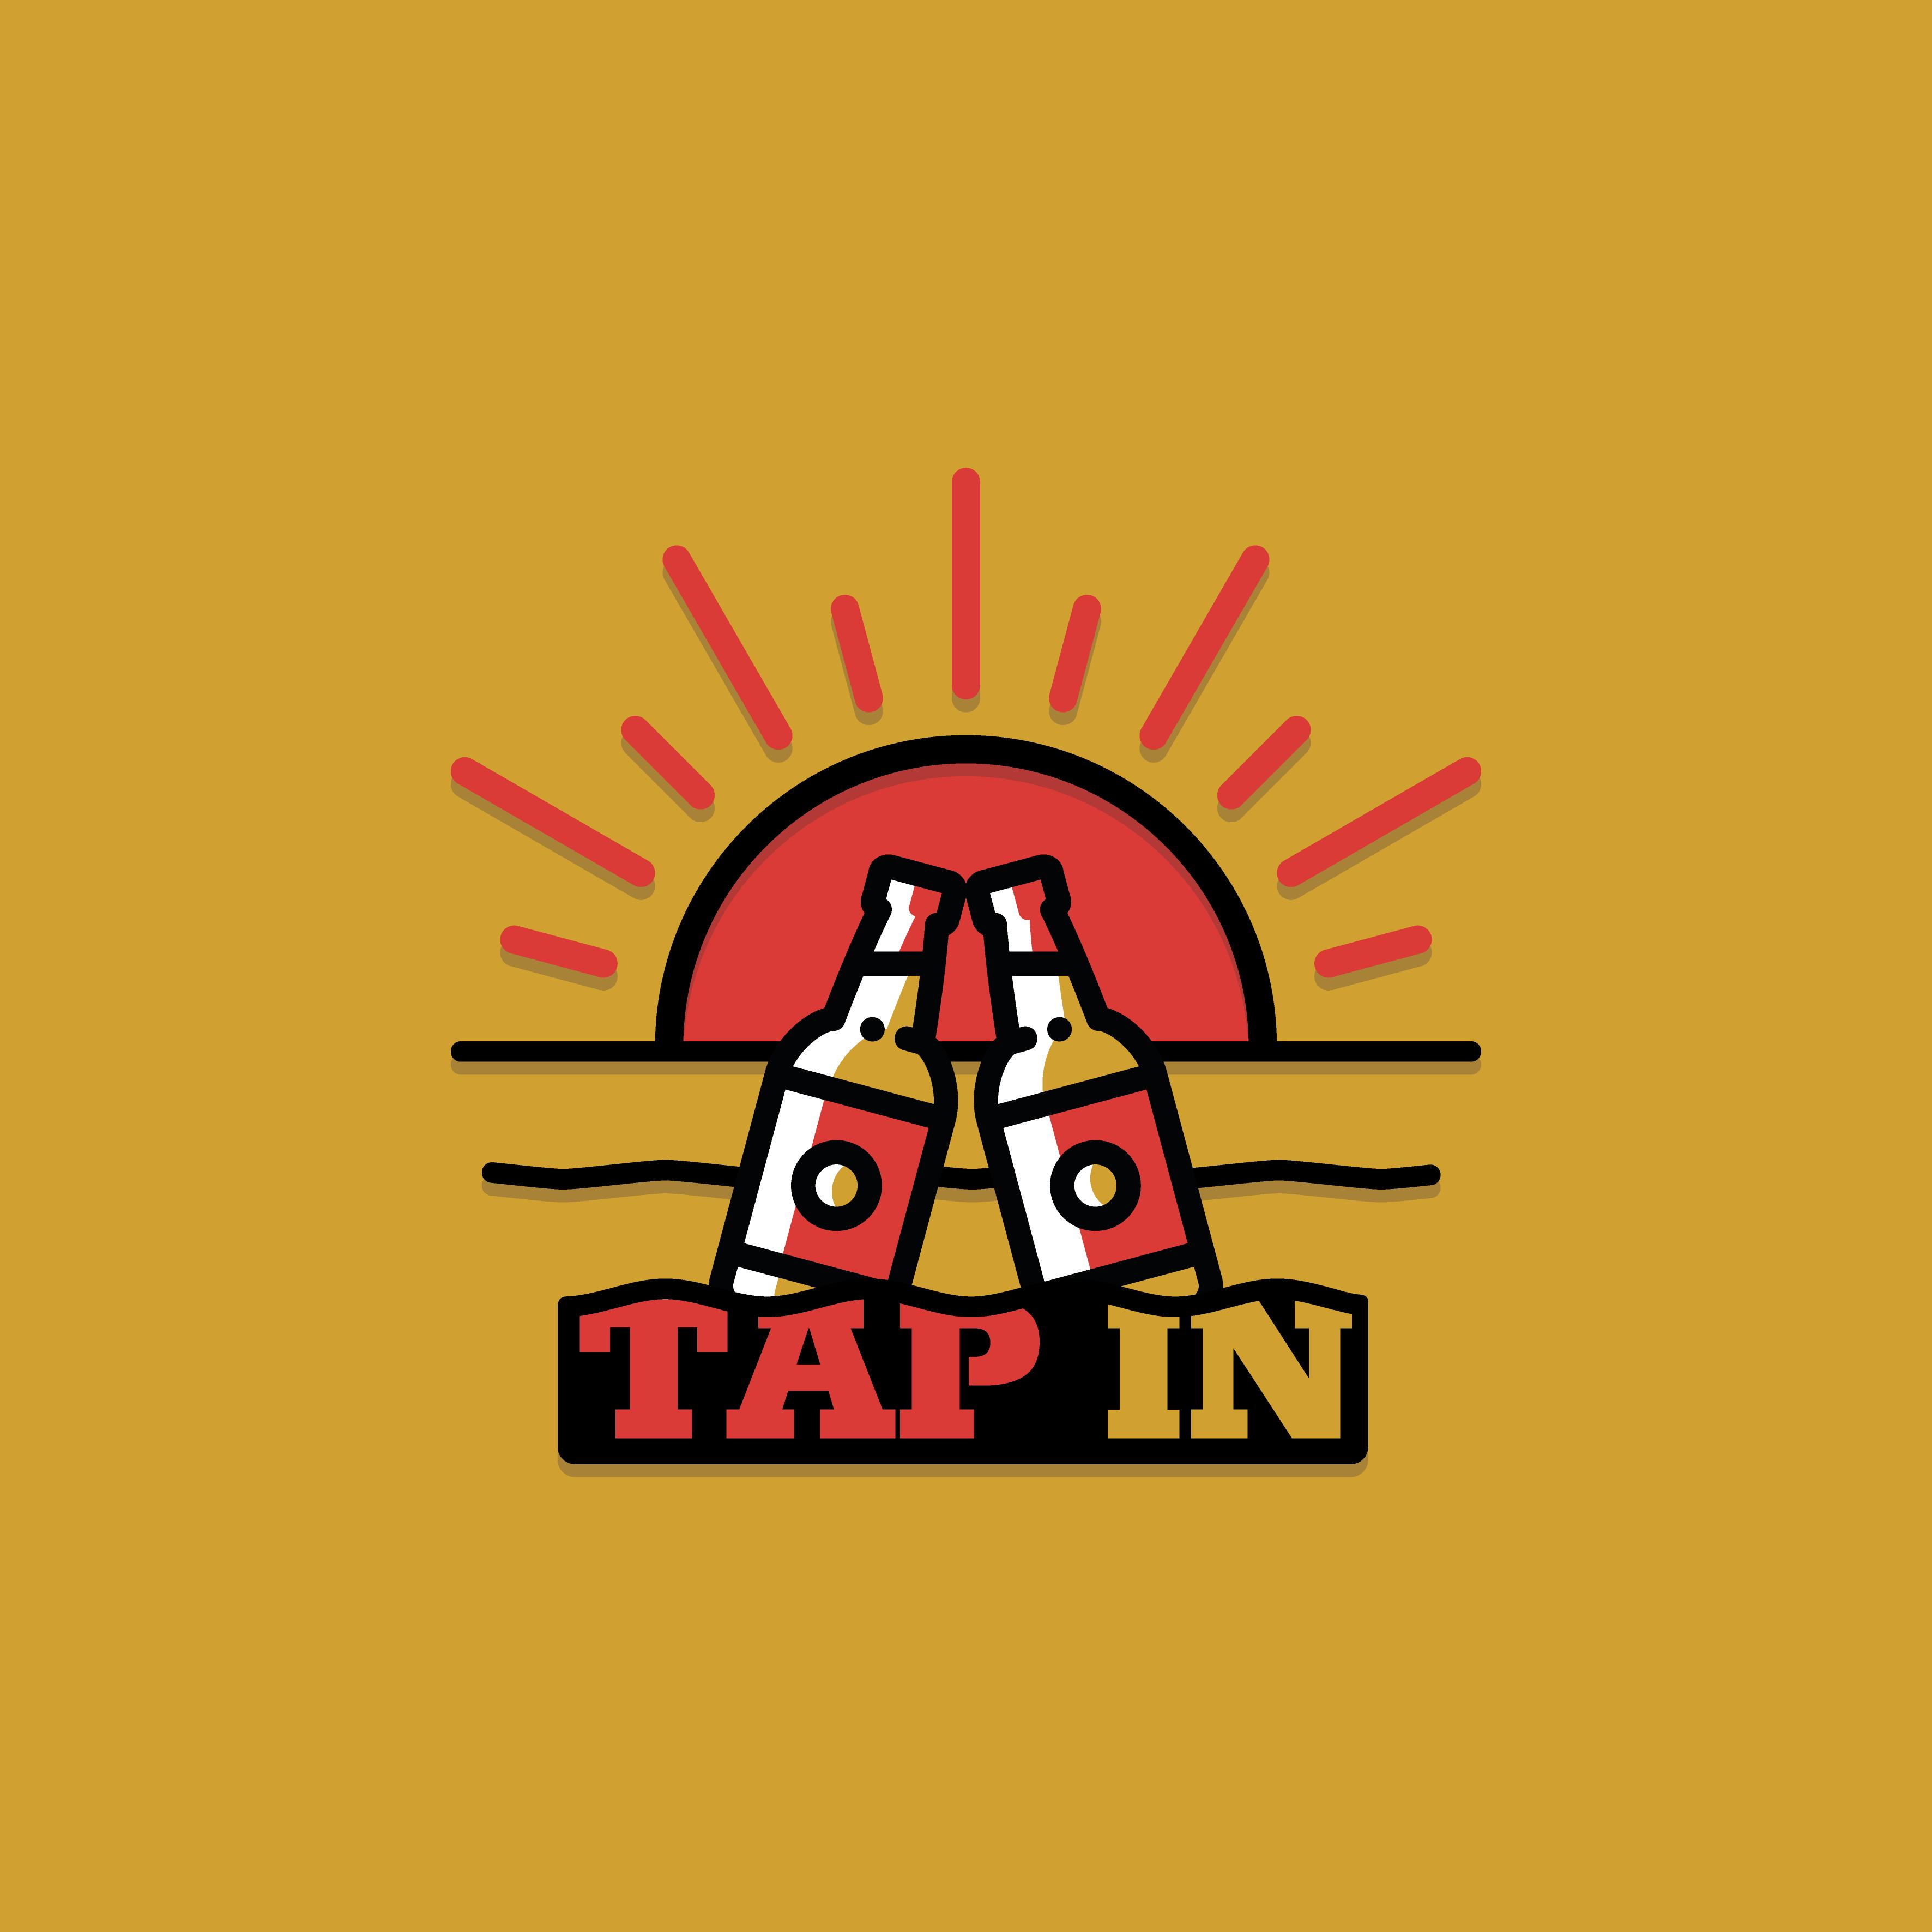 Masculine Elegant Logo Design For Tap In By Ryan Orlowski Design 22993001